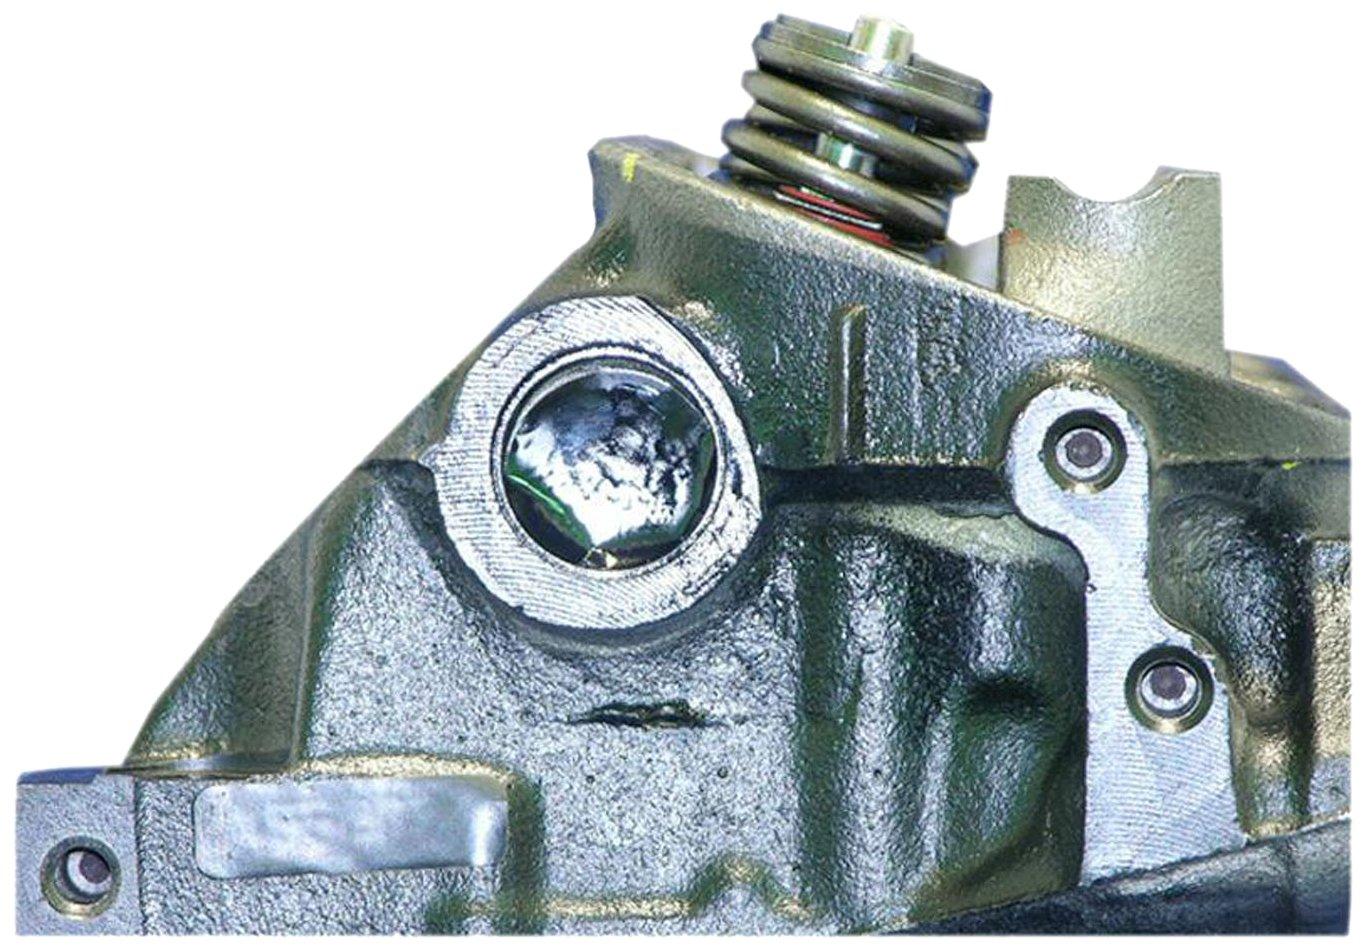 PROFessional Powertrain 2D05 Chrysler 360 71-74 Remanufactured Cylinder Head